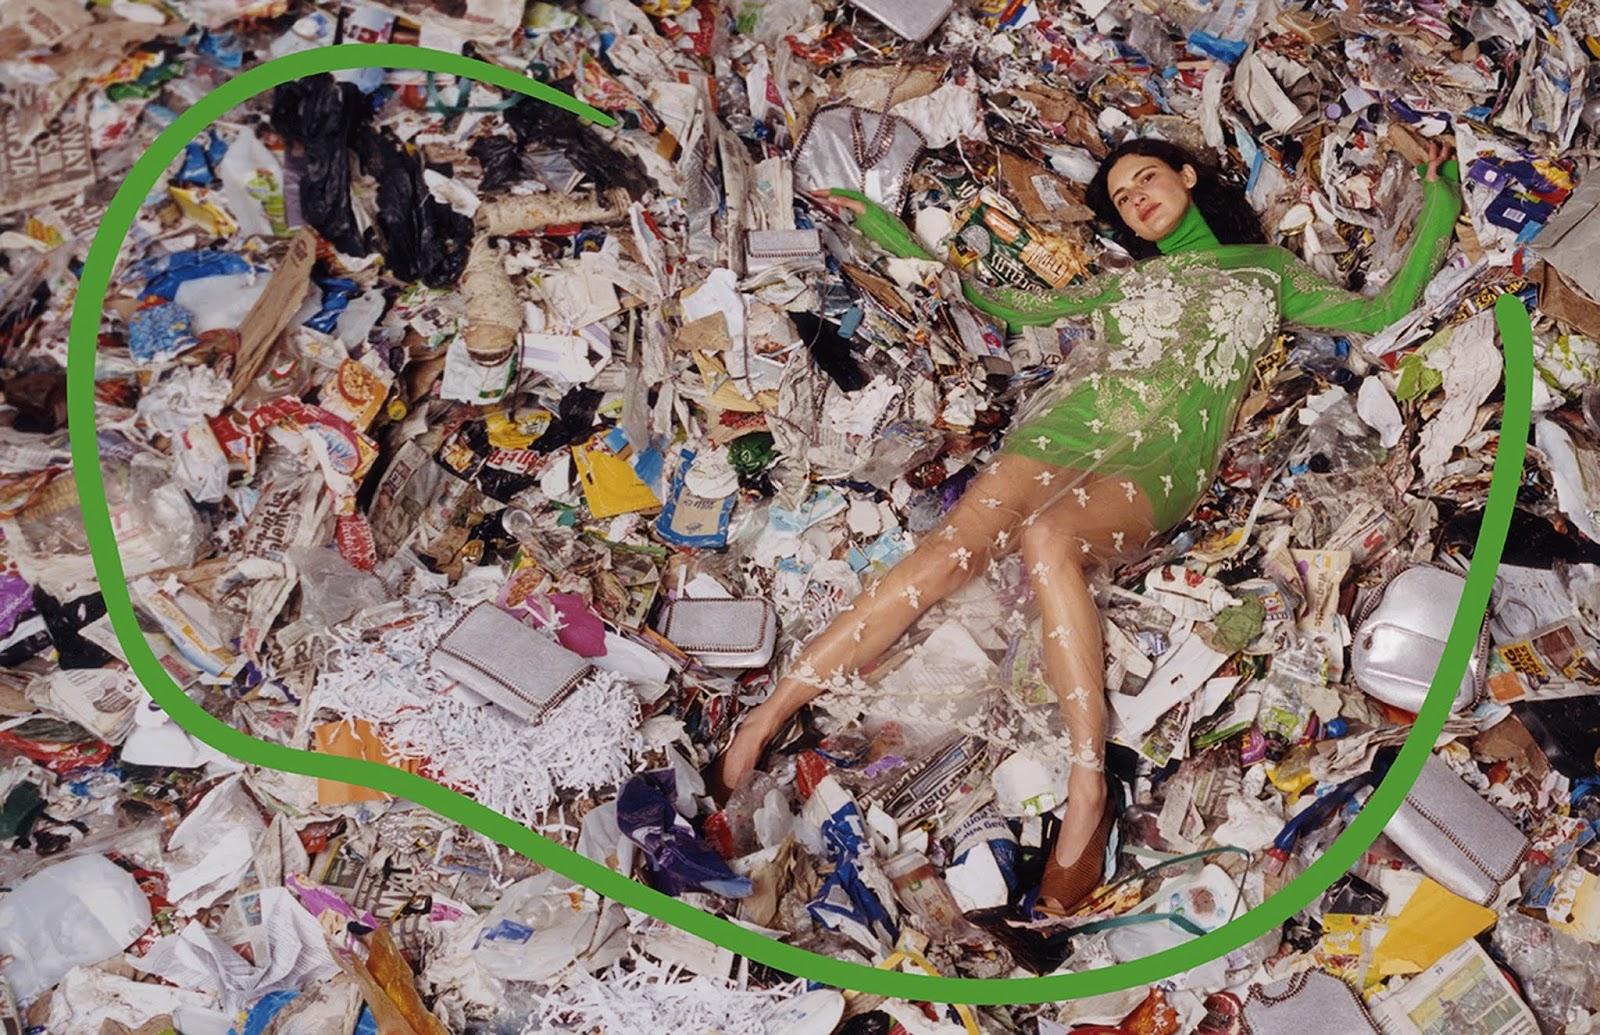 Modelo luciendo tenida de marca Stella McCartney sobre basura de un vertedero de Escocia